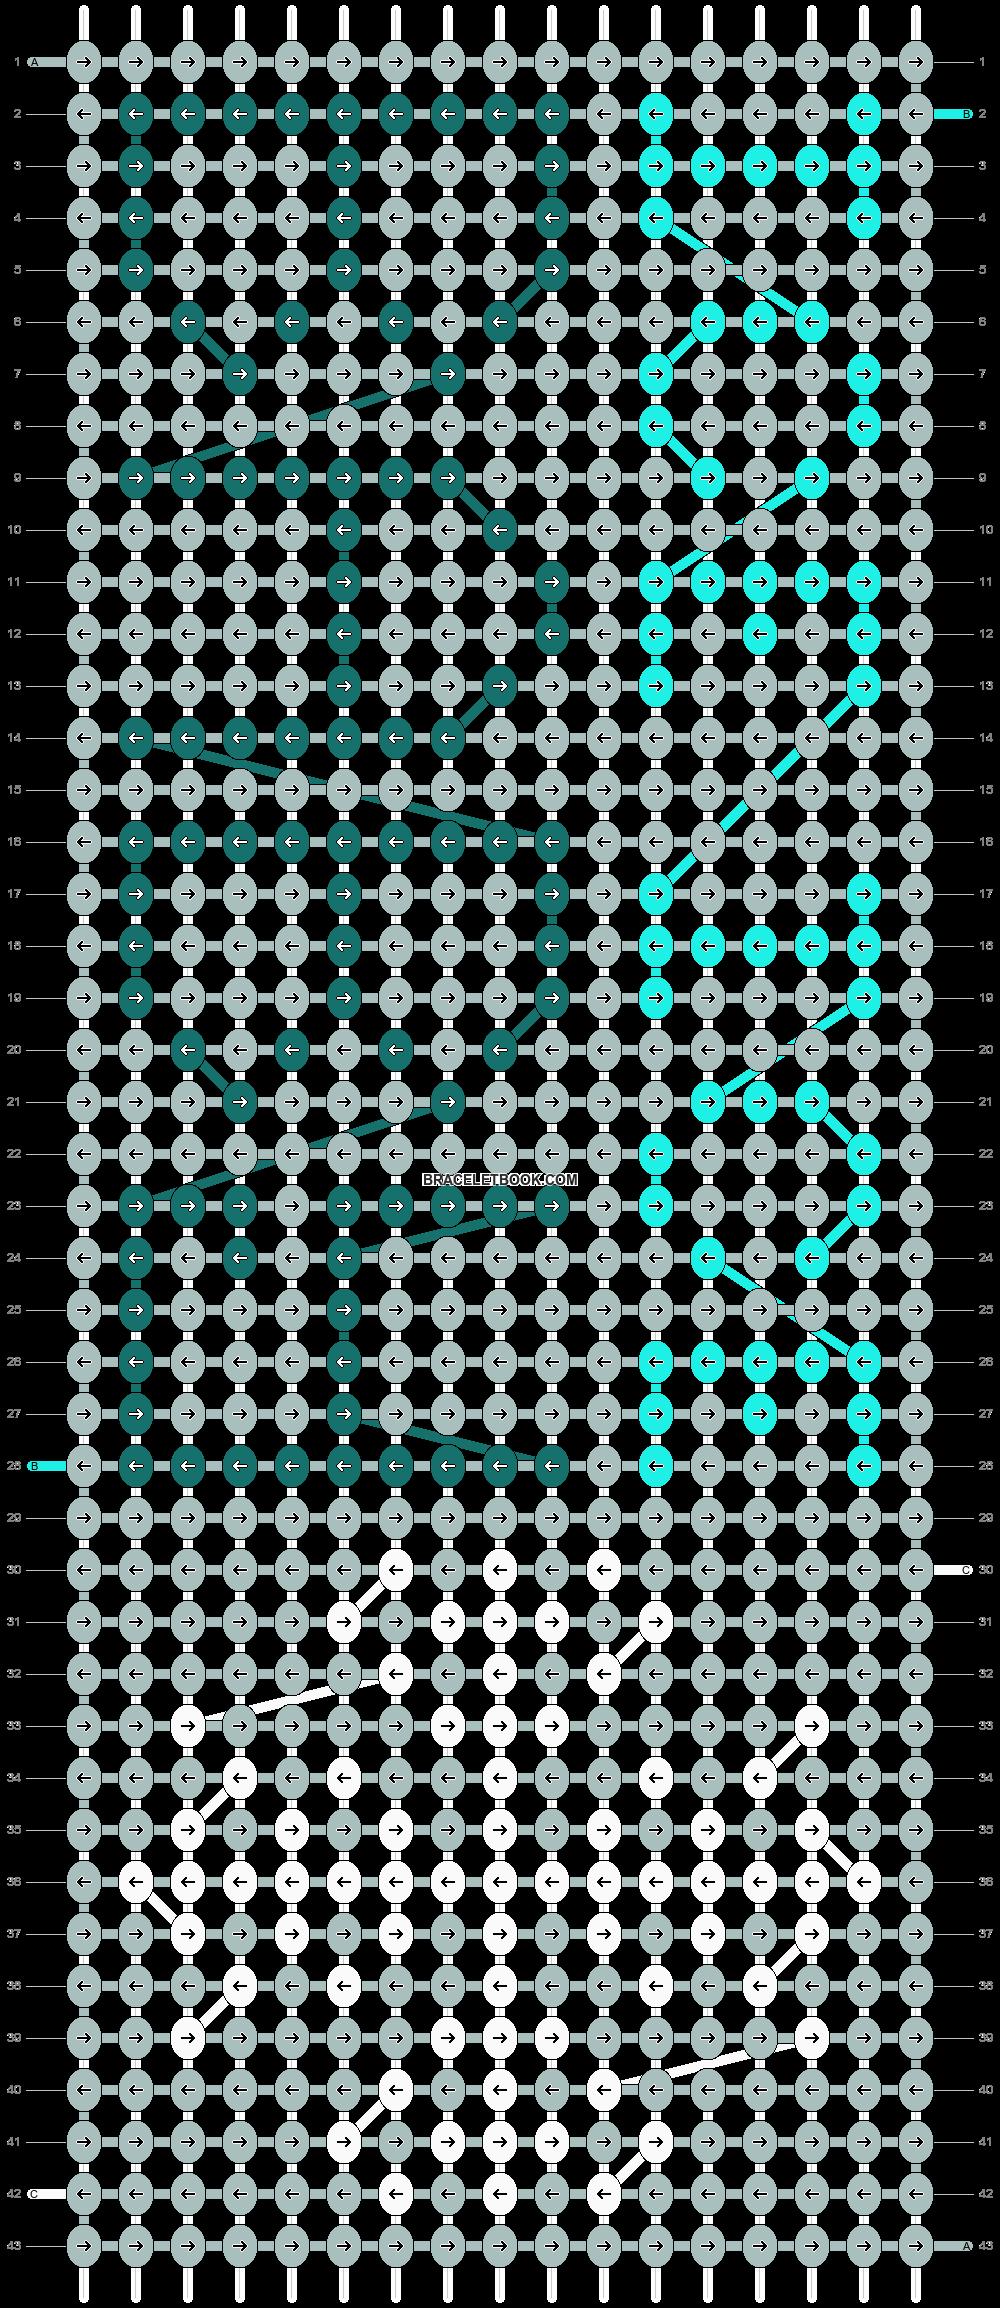 Alpha Pattern #15462 added by Mermaid12